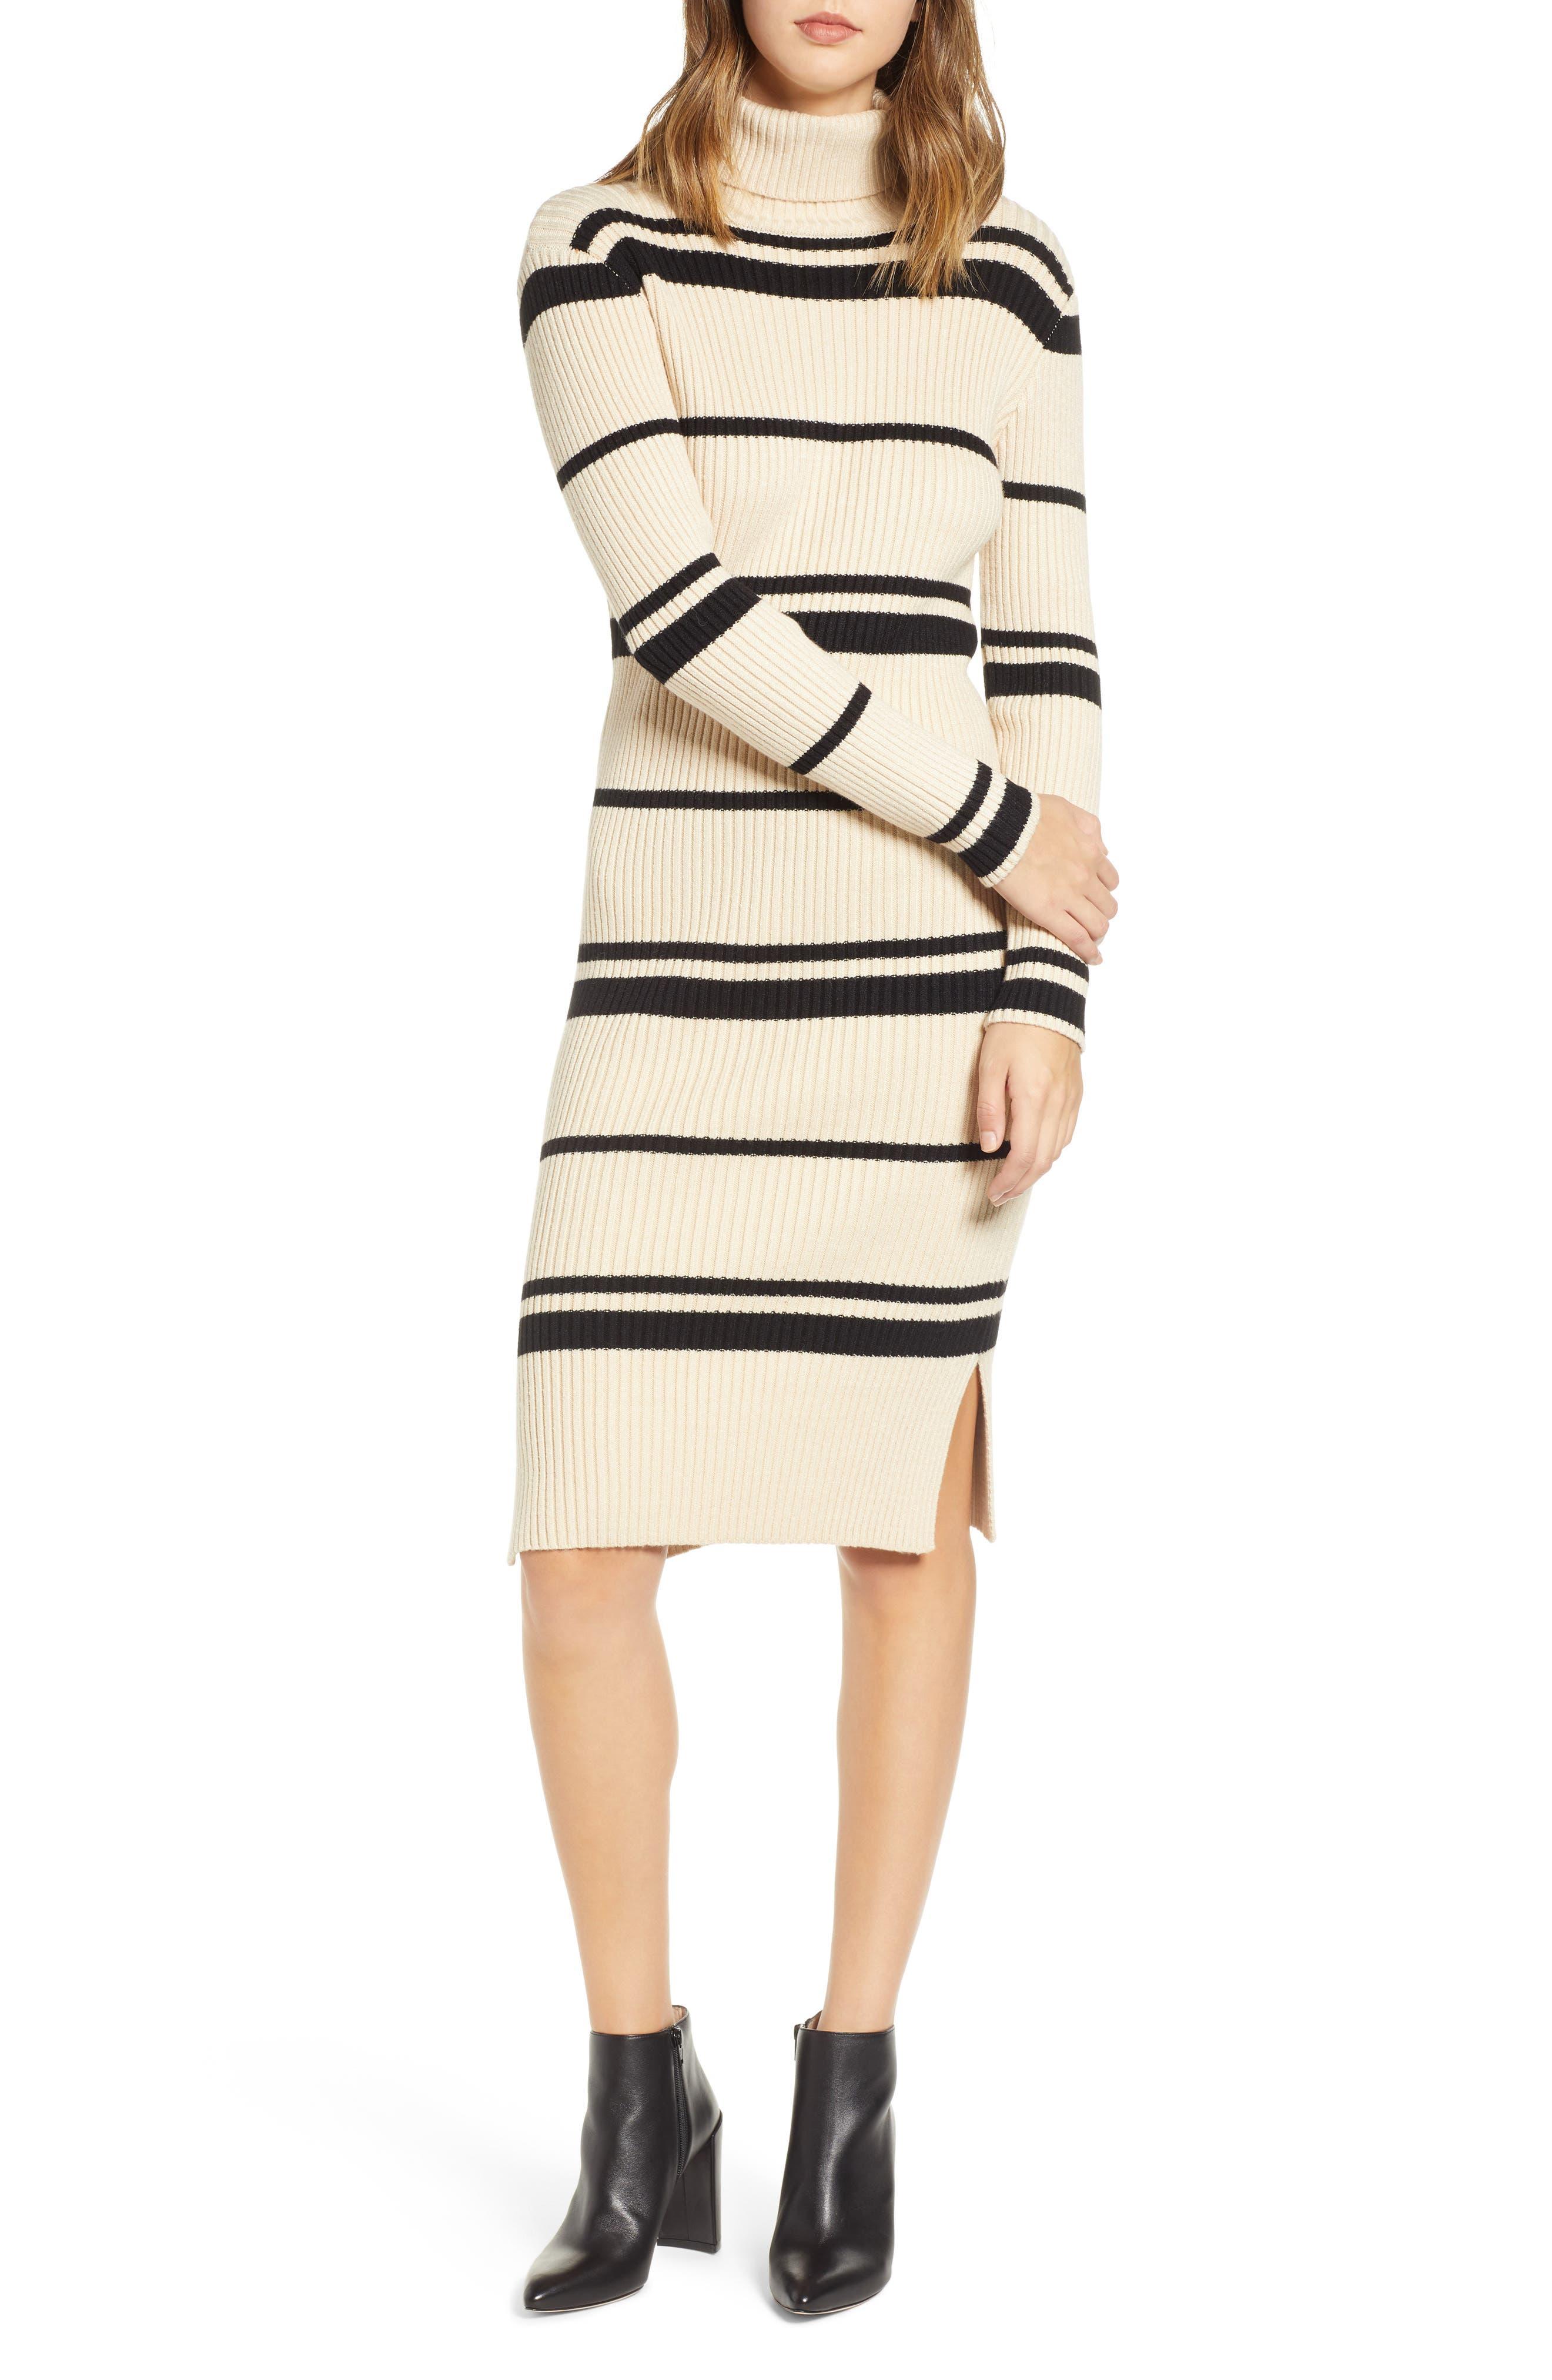 JOA Stripe Turtleneck Dress in Cream/ Black